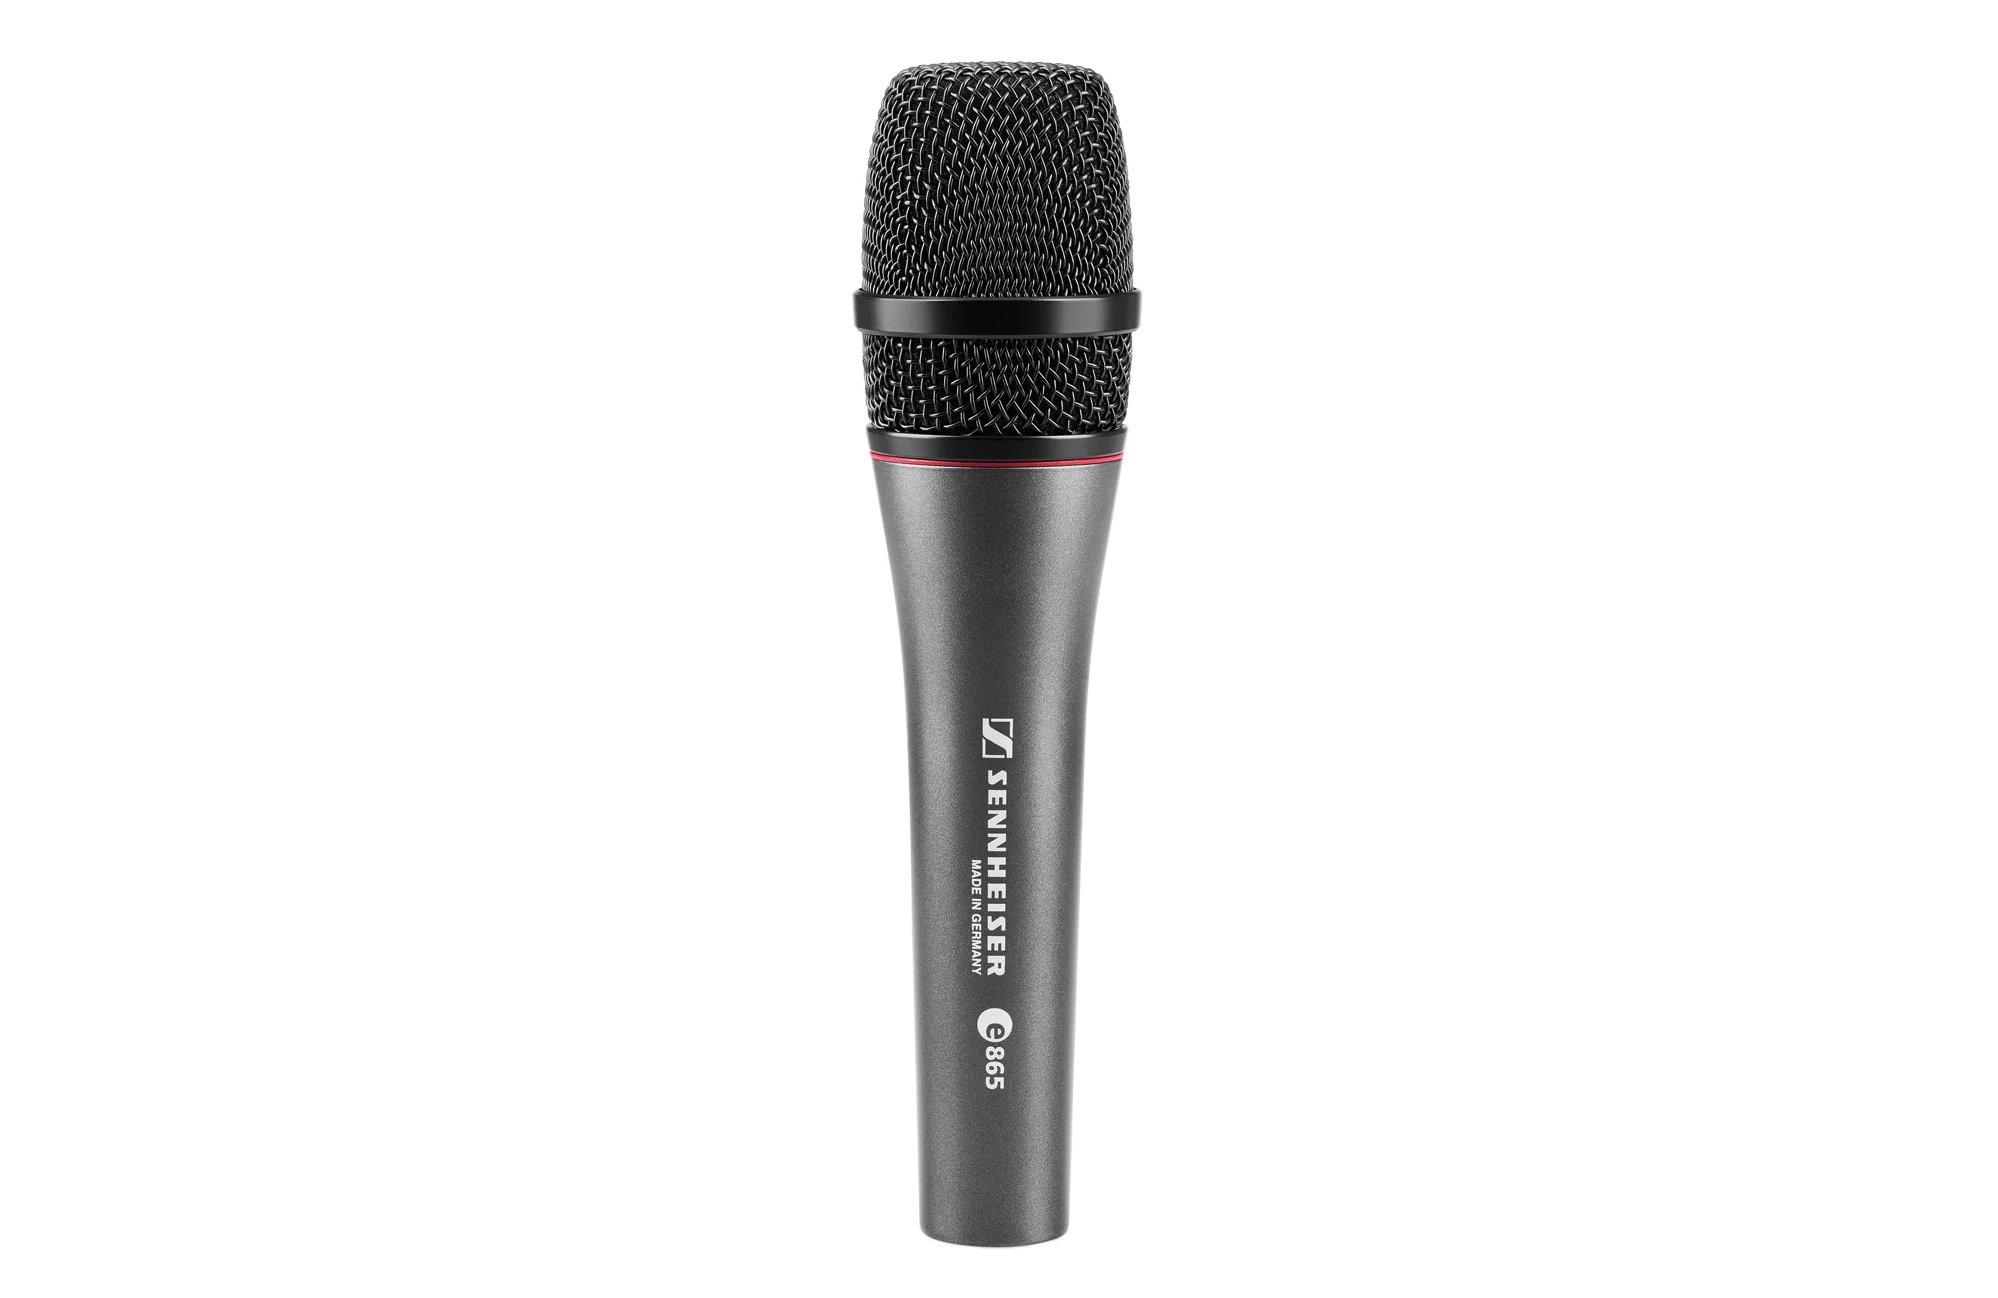 evolution Series Handheld Supercardioid Condenser Vocal Microphone